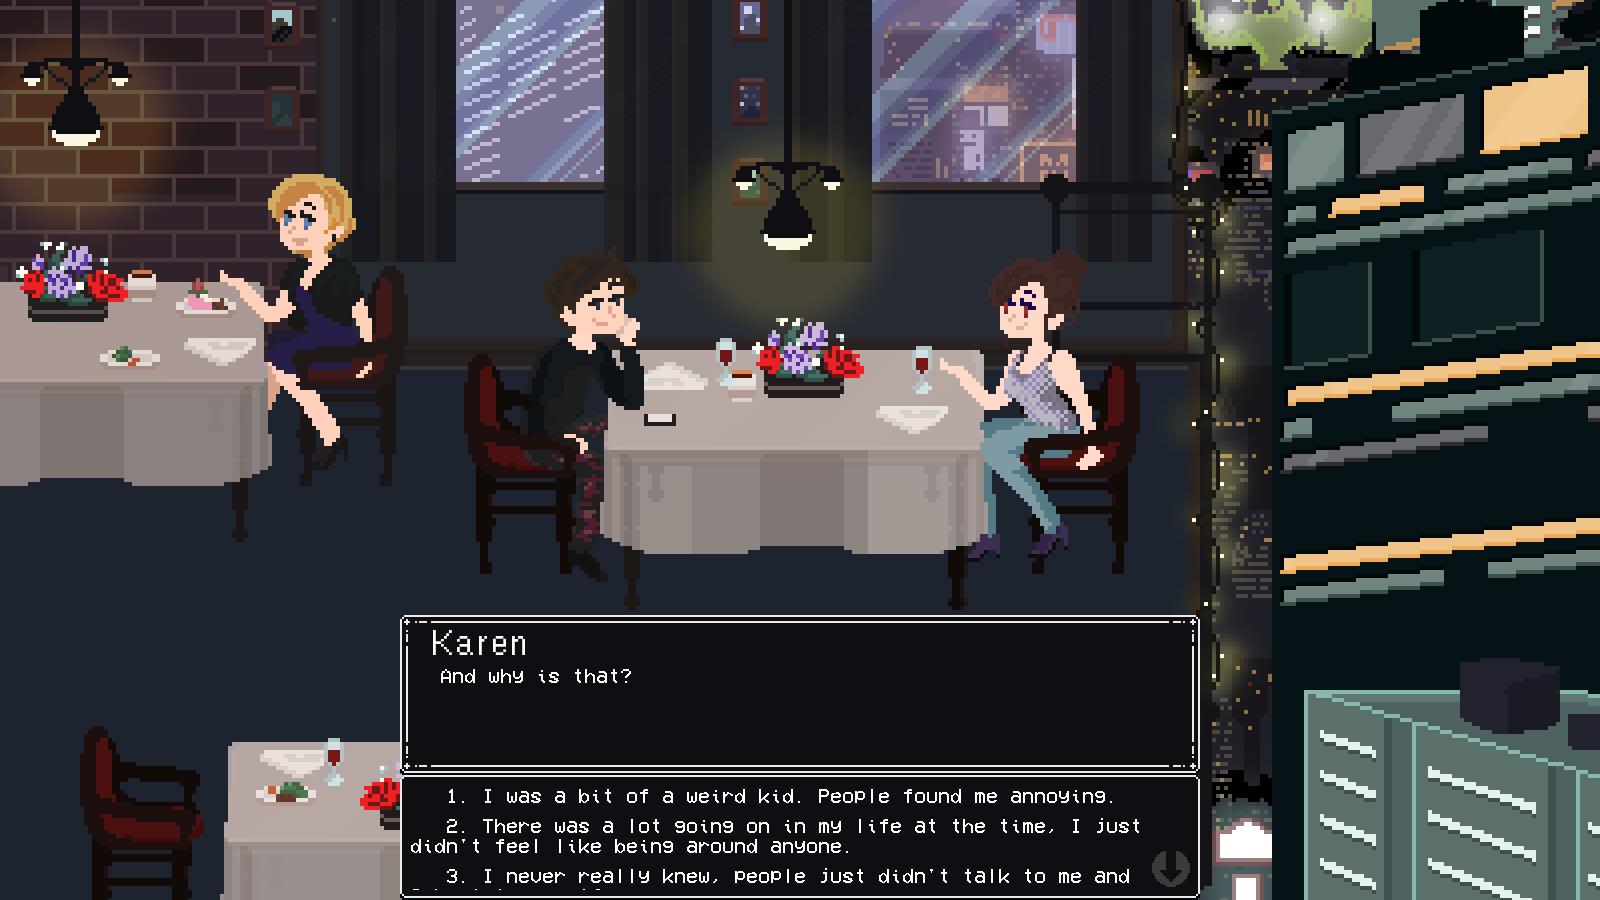 strange dating games